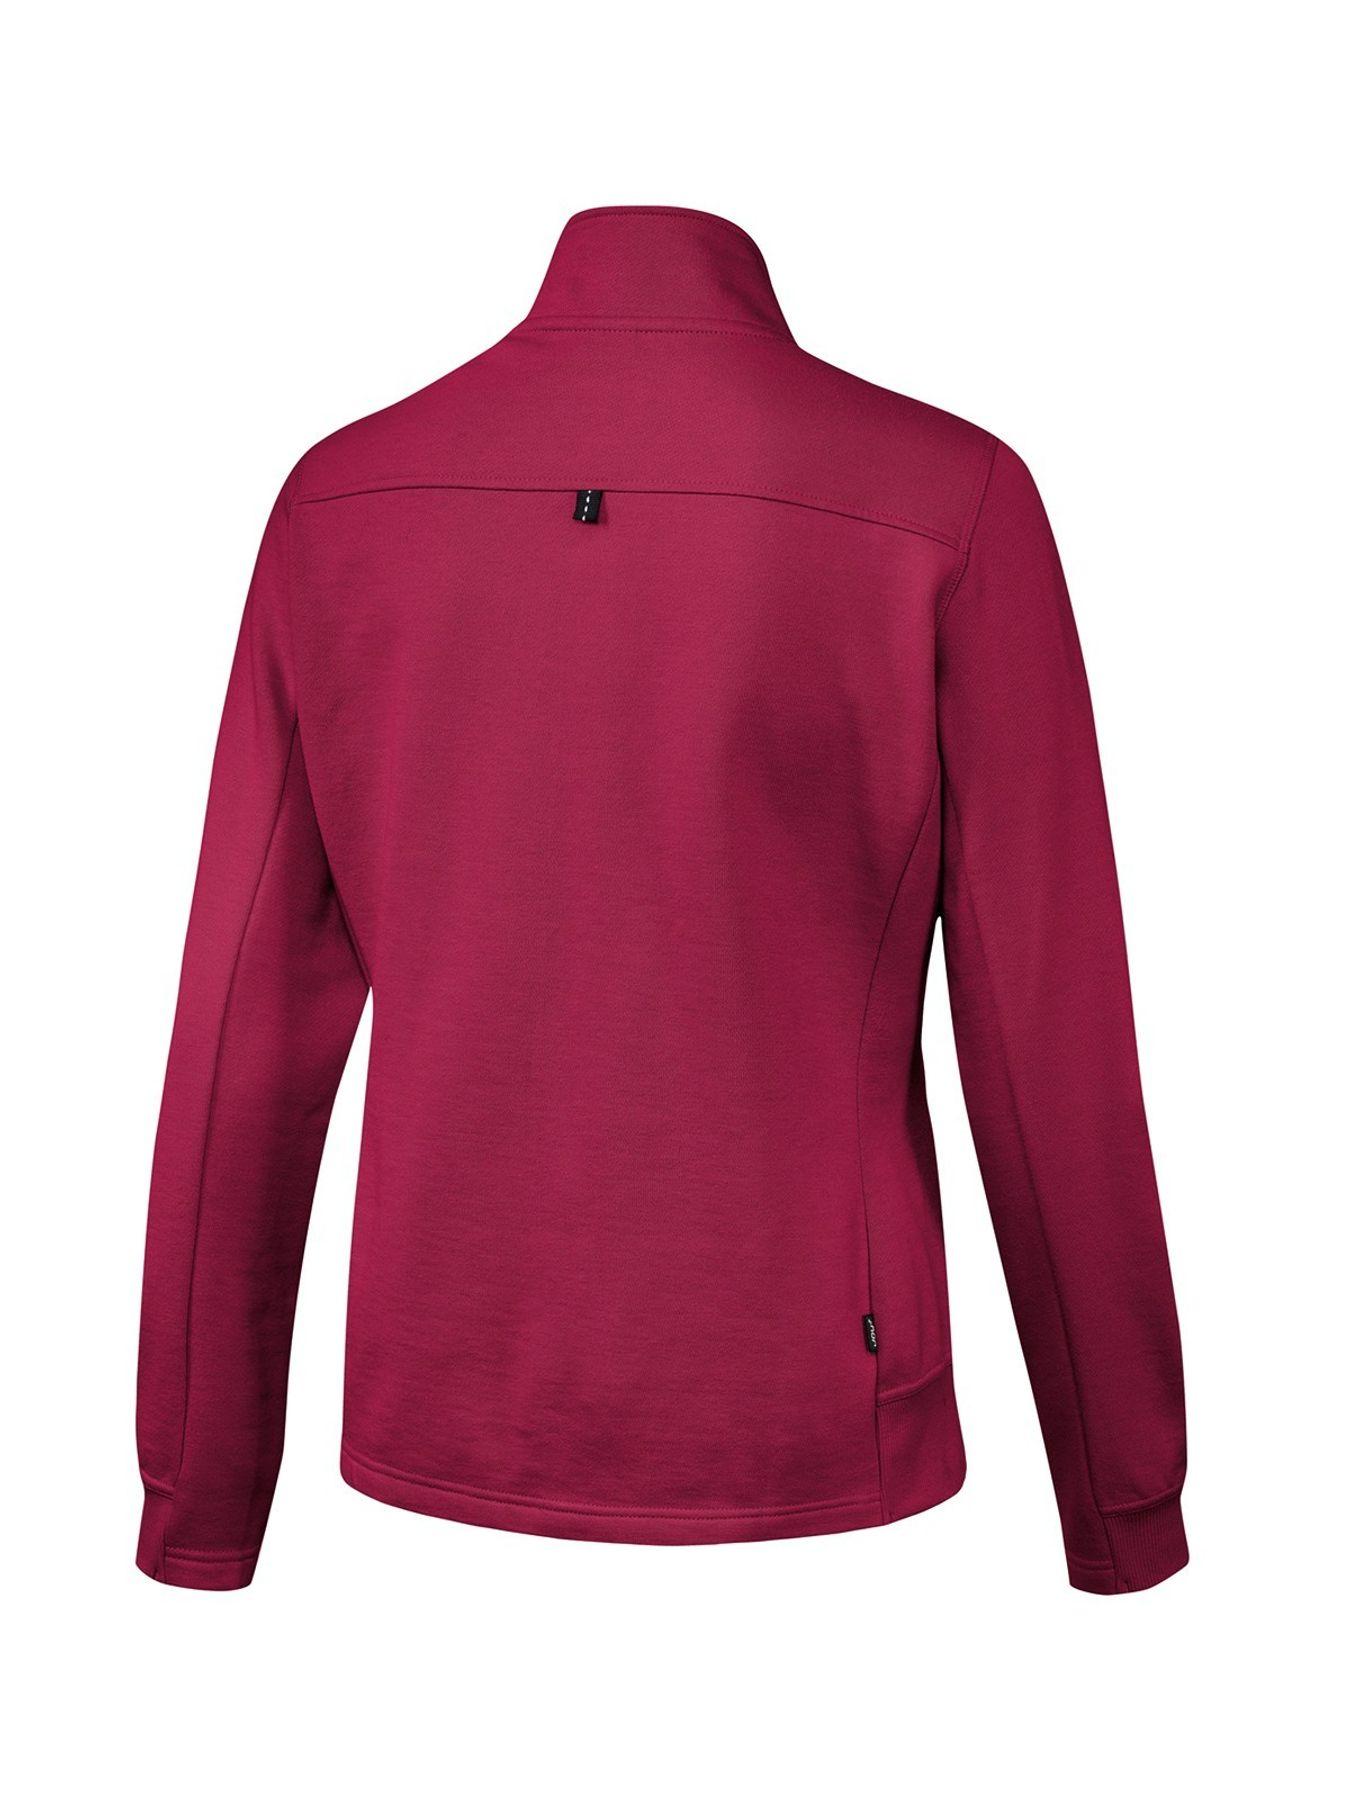 Joy - Damen Sport und Freizeit Jacke in mehreren Farben, Paulina (34500) – Bild 16